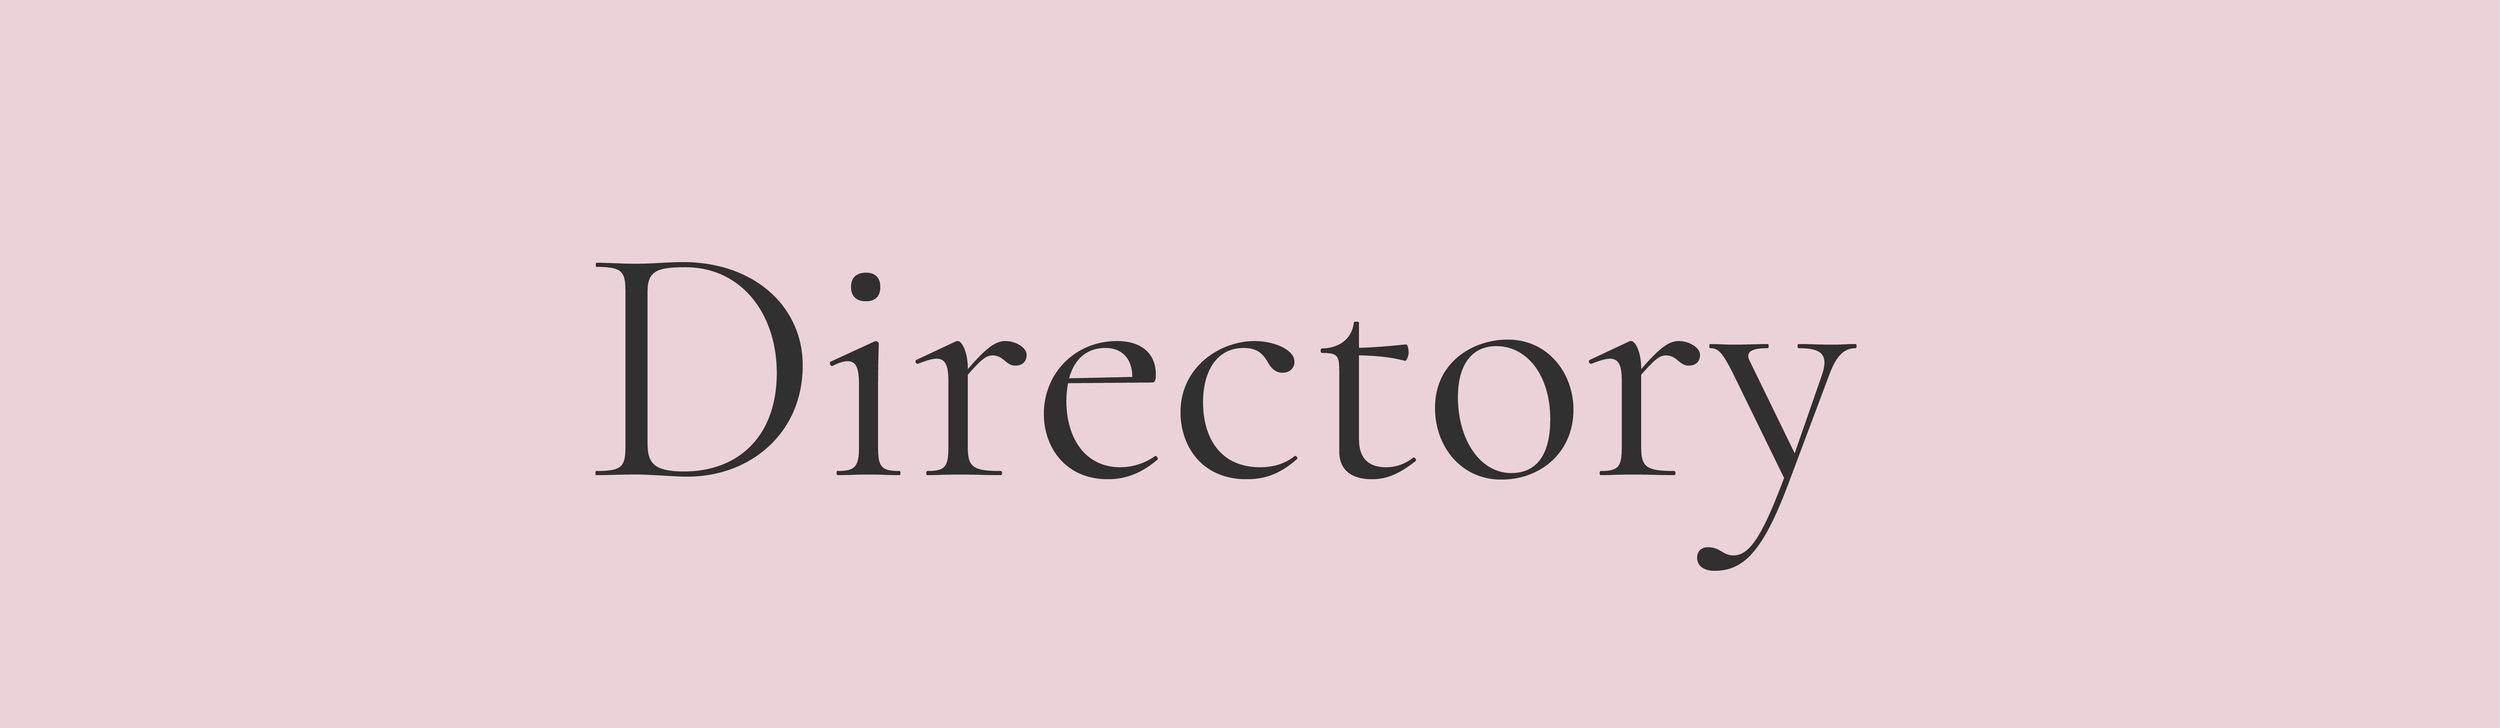 Directory 3.jpg